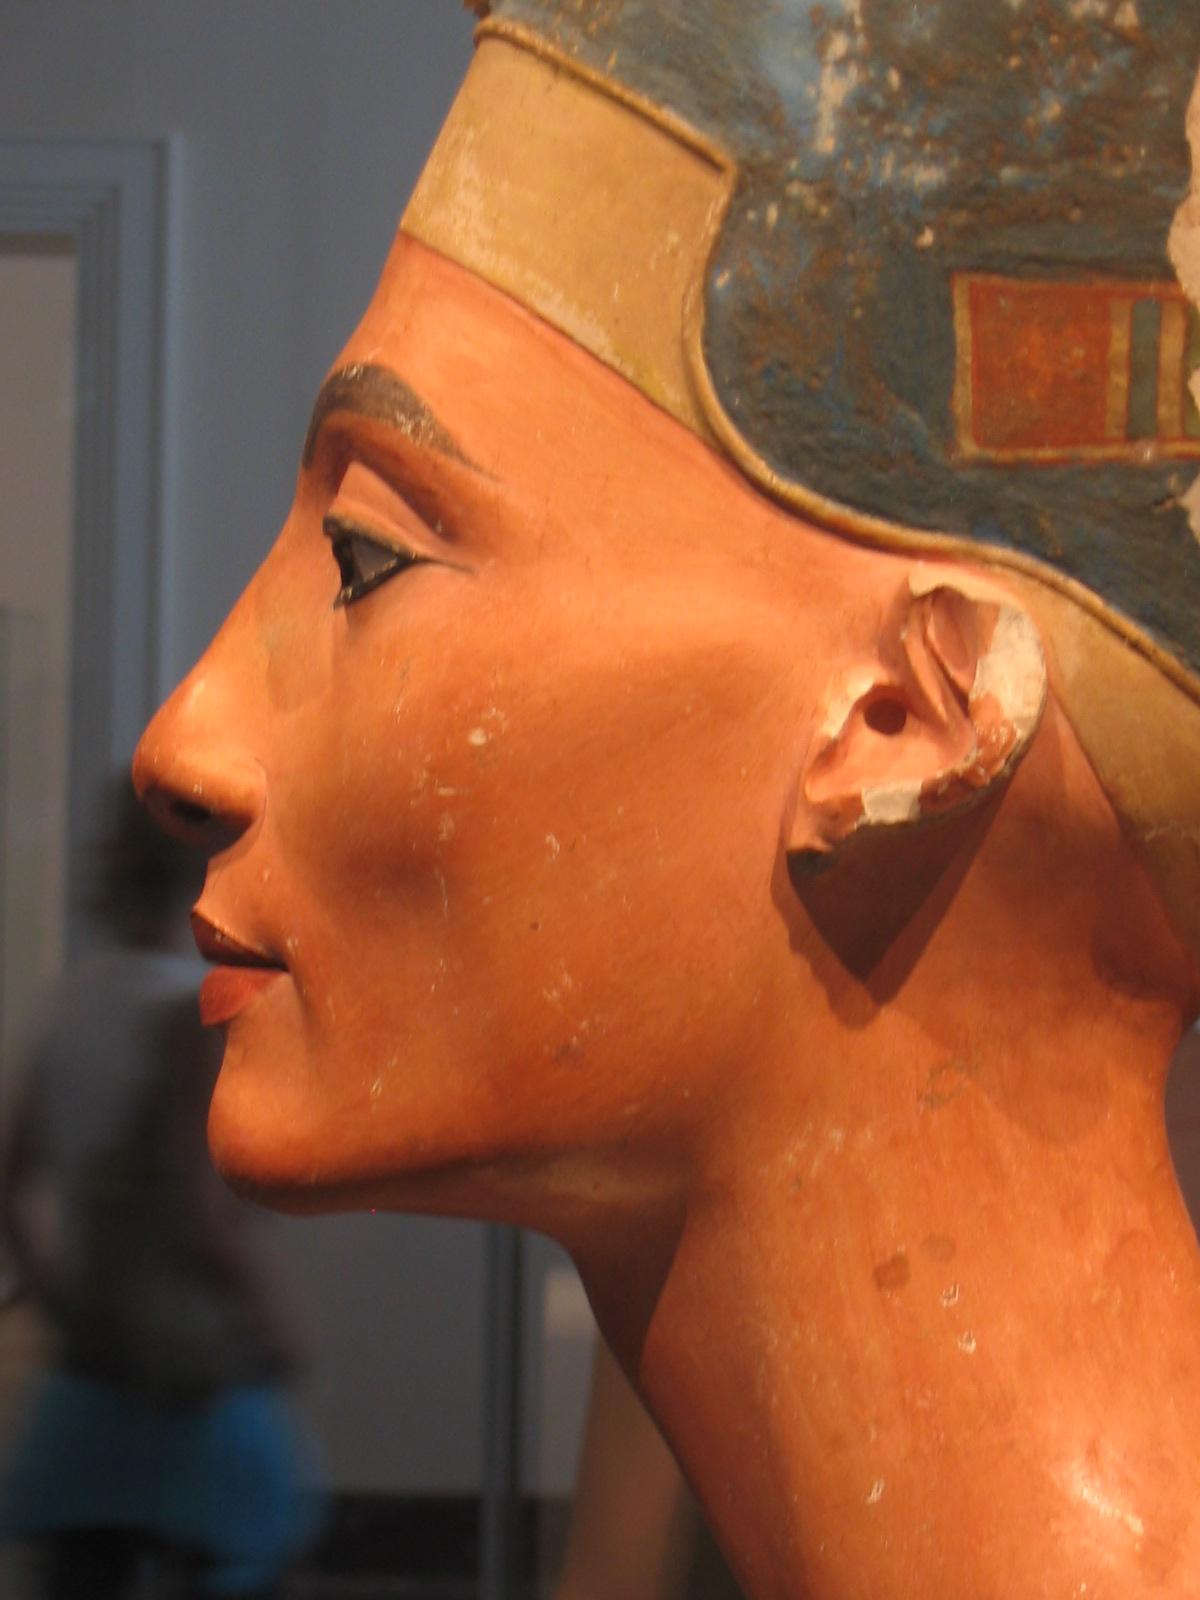 Bust of Nefertiti. Photo taken on March 1, 2003.